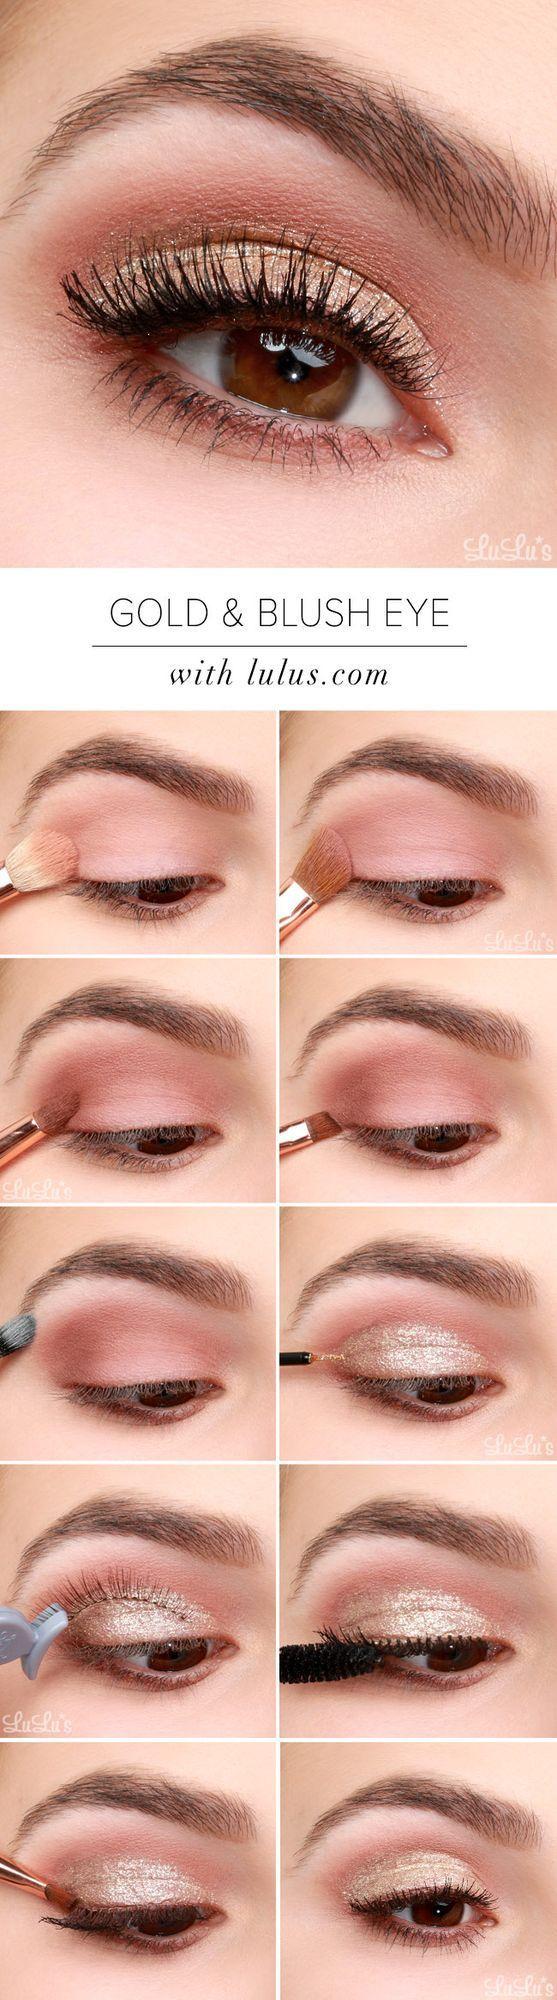 LuLu*s How-To: Gold and Blush Valentine's Day Eye Makeup Tutorial | Lulus.com Fashion Blog | Bloglovin'